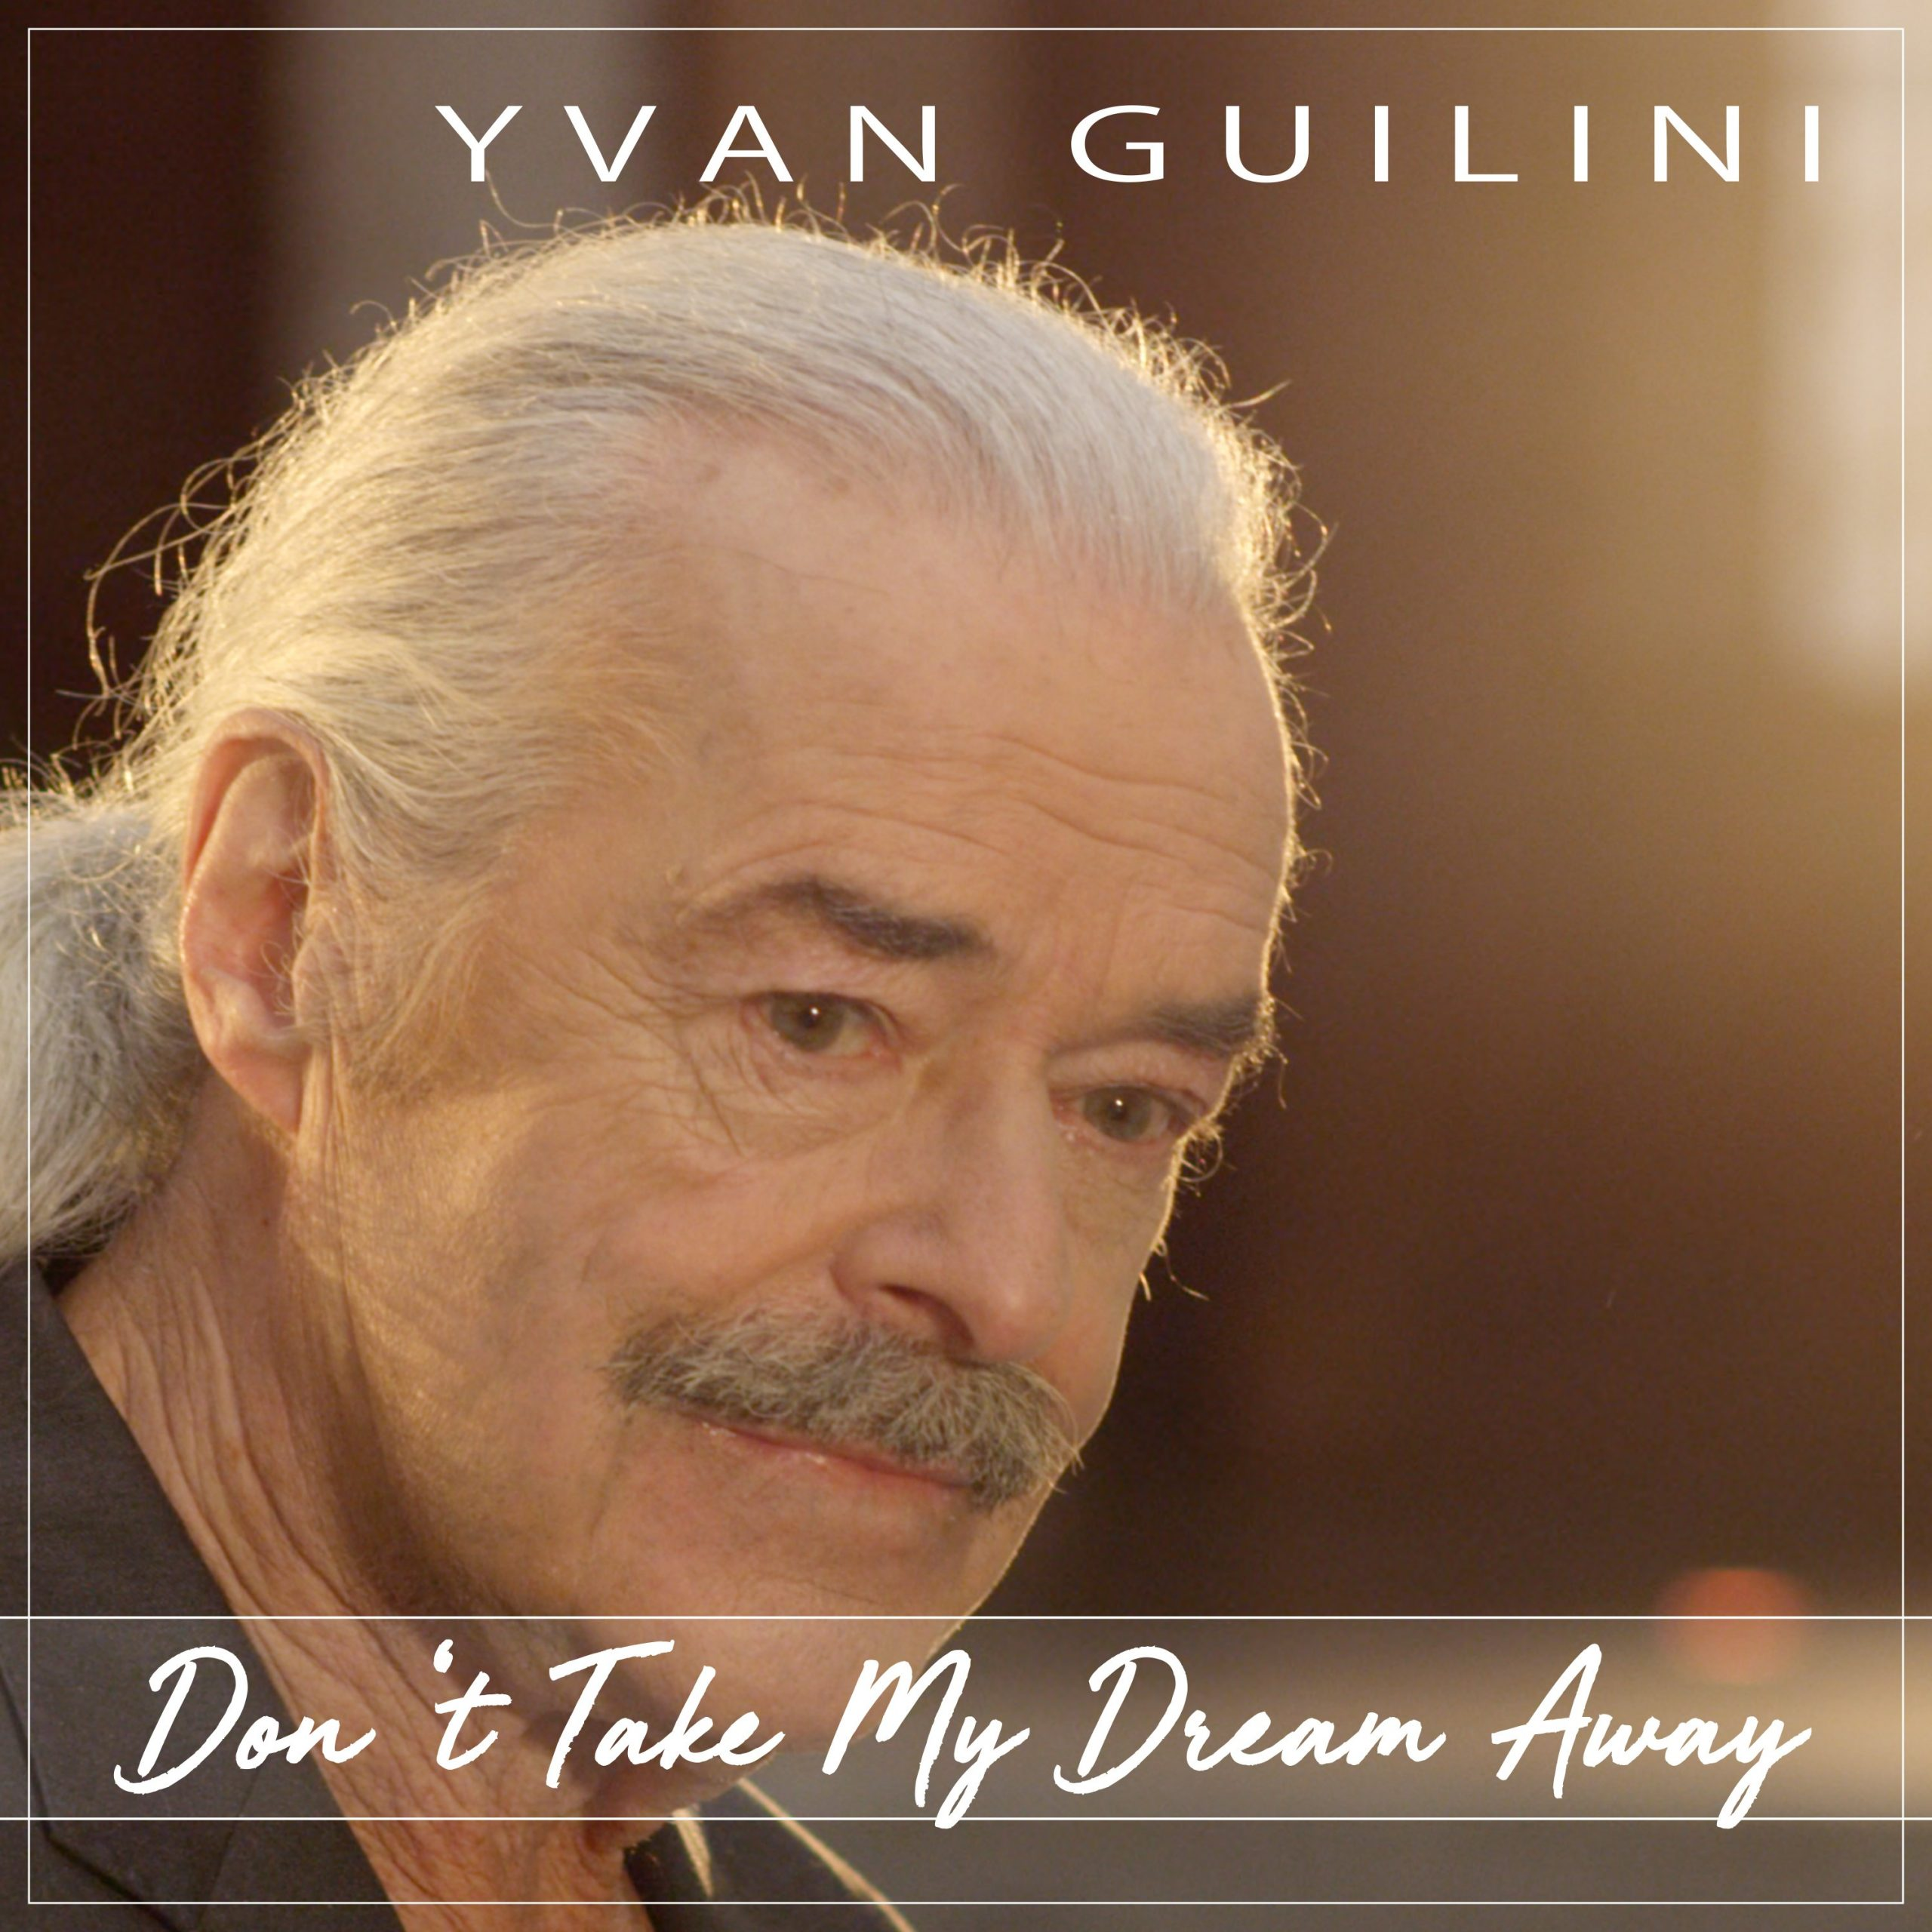 Yvan Guilini vond inspiratie tijdens het koken - Hoes Yvan Guilini Dont take my dream away scaled